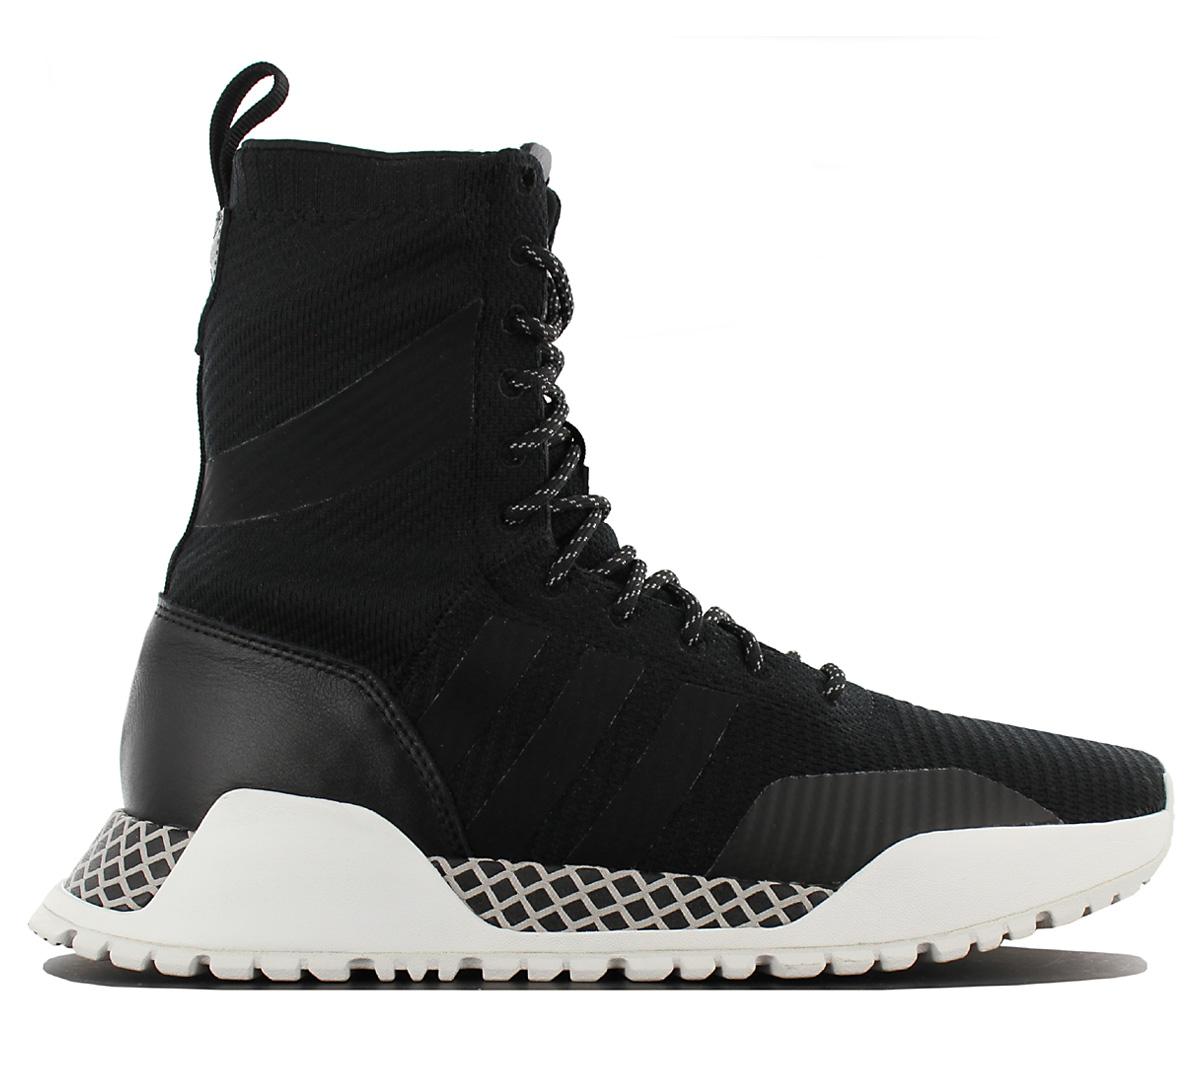 Adidas Originals F 1.3 Pk Primeknit Men s Shoes Sneaker Boots By9781 ... 74e63a991